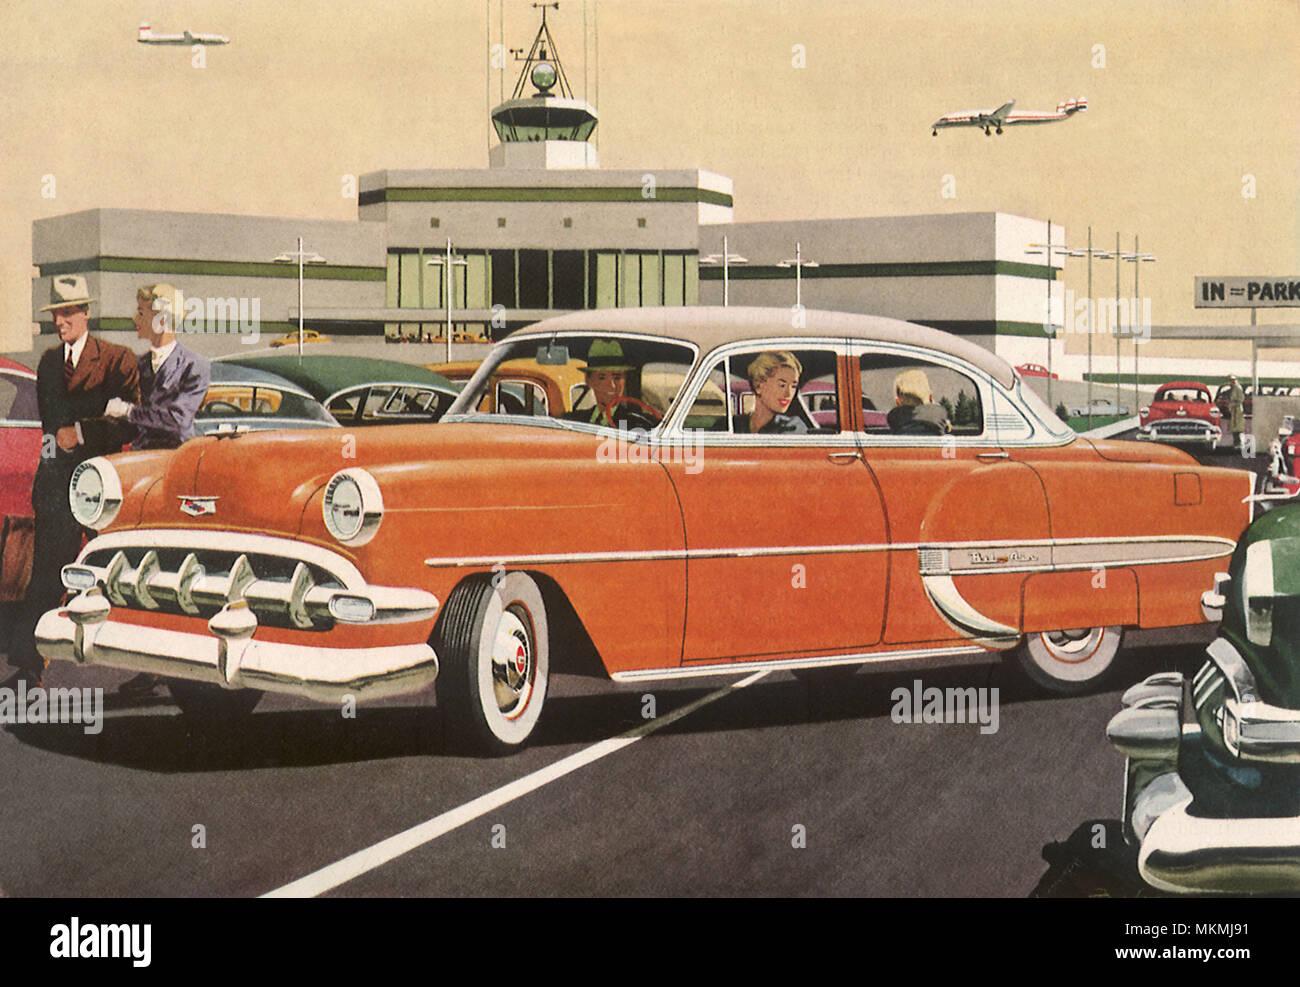 1954 Chevrolet Bel Air Sedan Stock Photo 184235549 Alamy Chevy